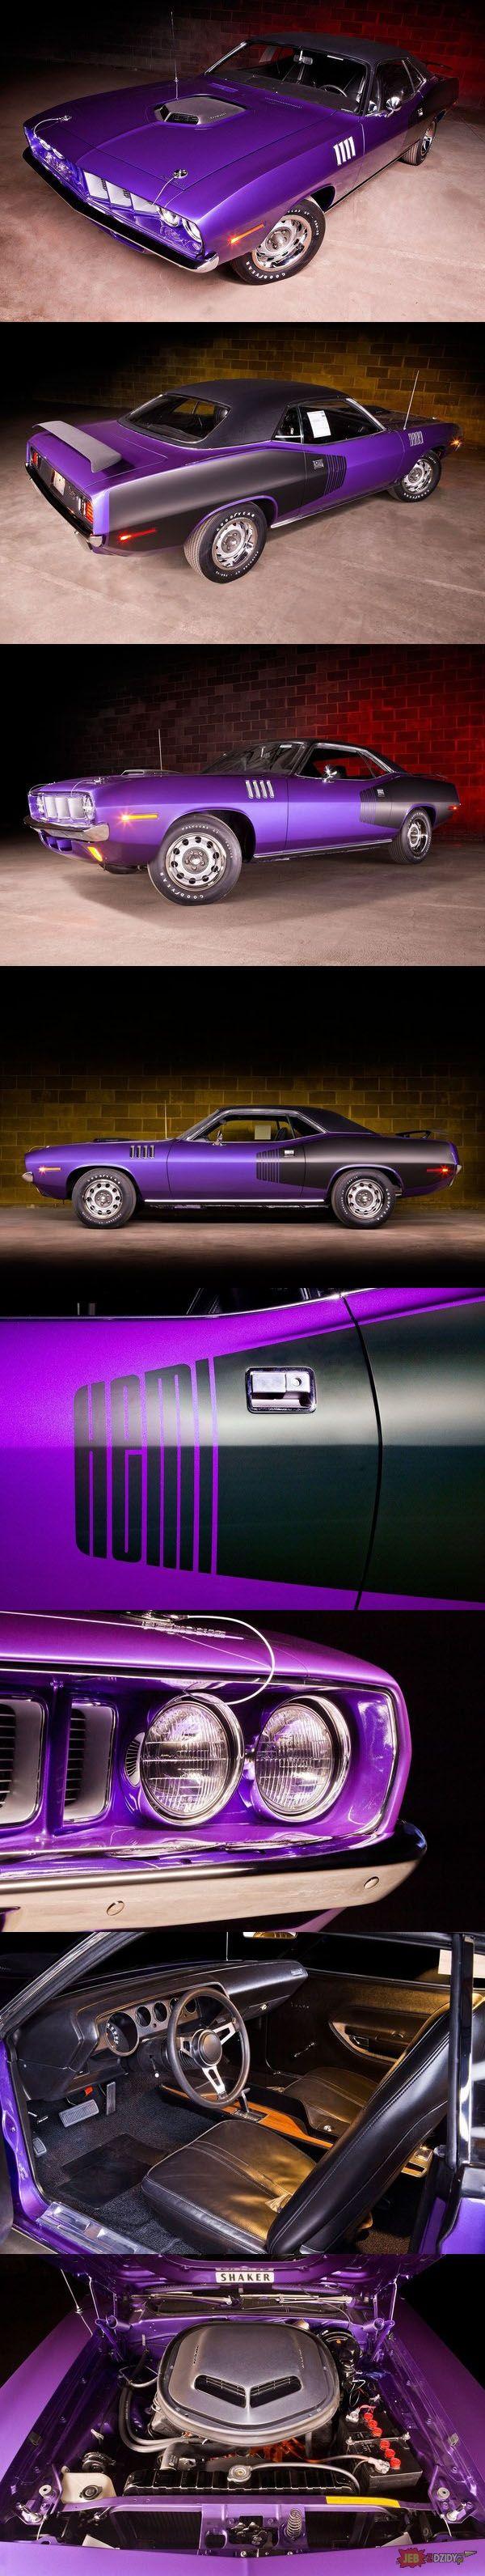 1971 Plymouth Hemi 'Cuda